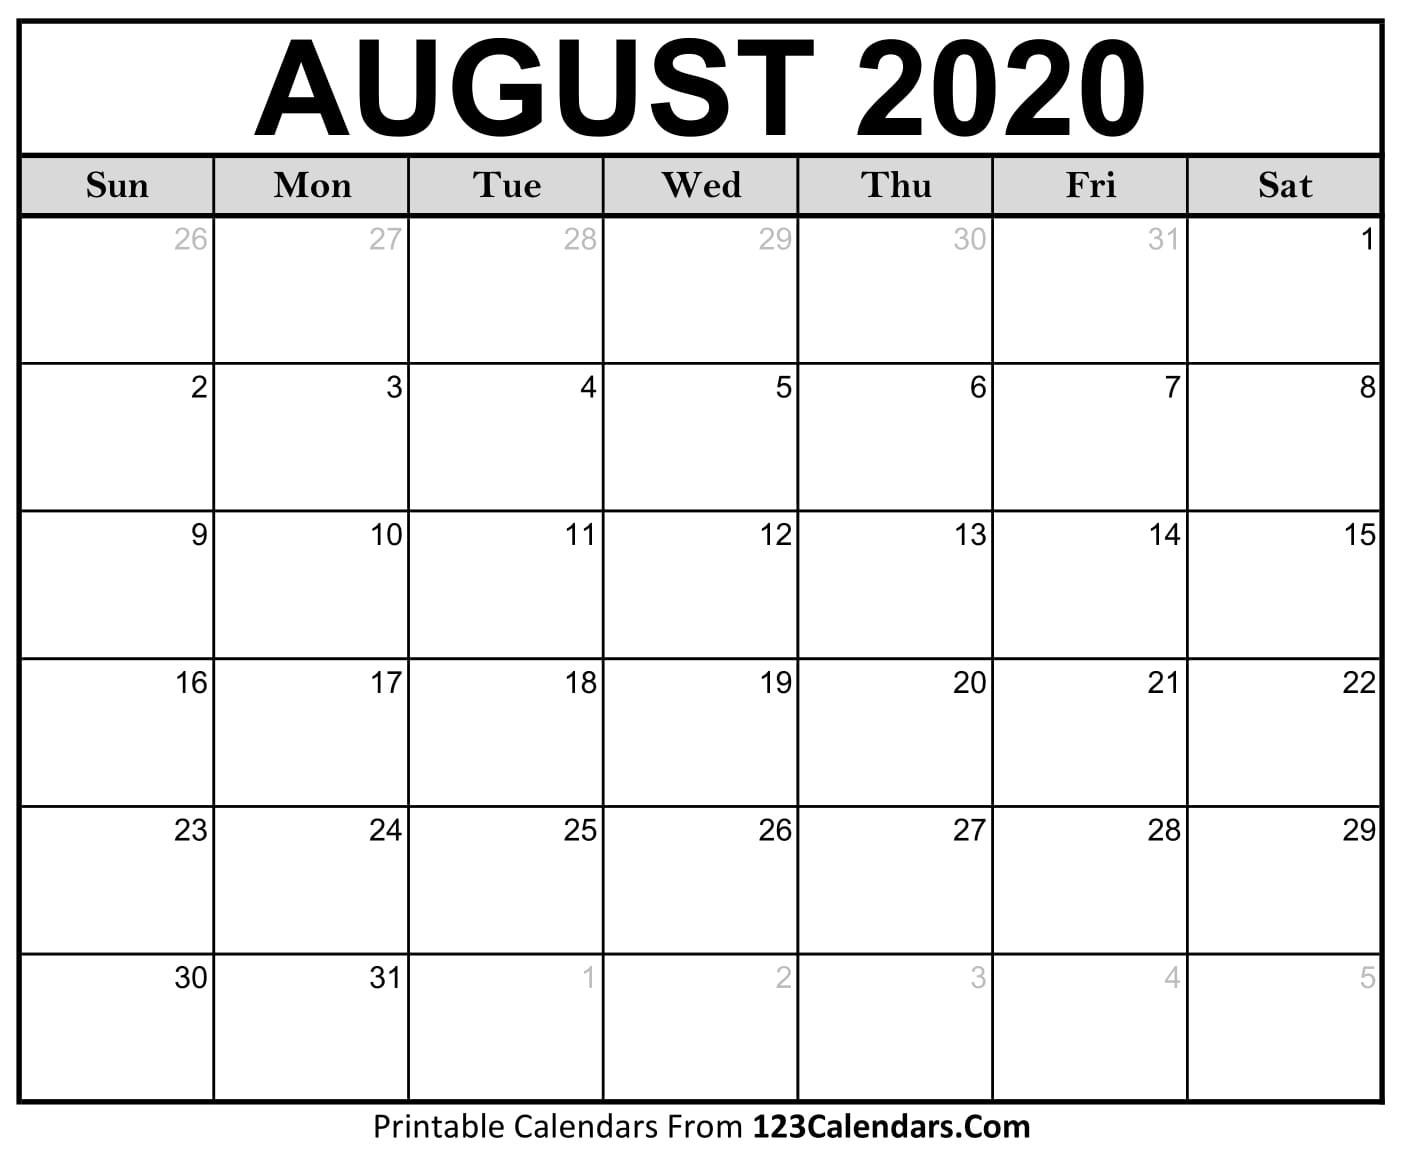 August 2020 Printable Calendar | 123Calendars-Blank Calendar June July August 2020